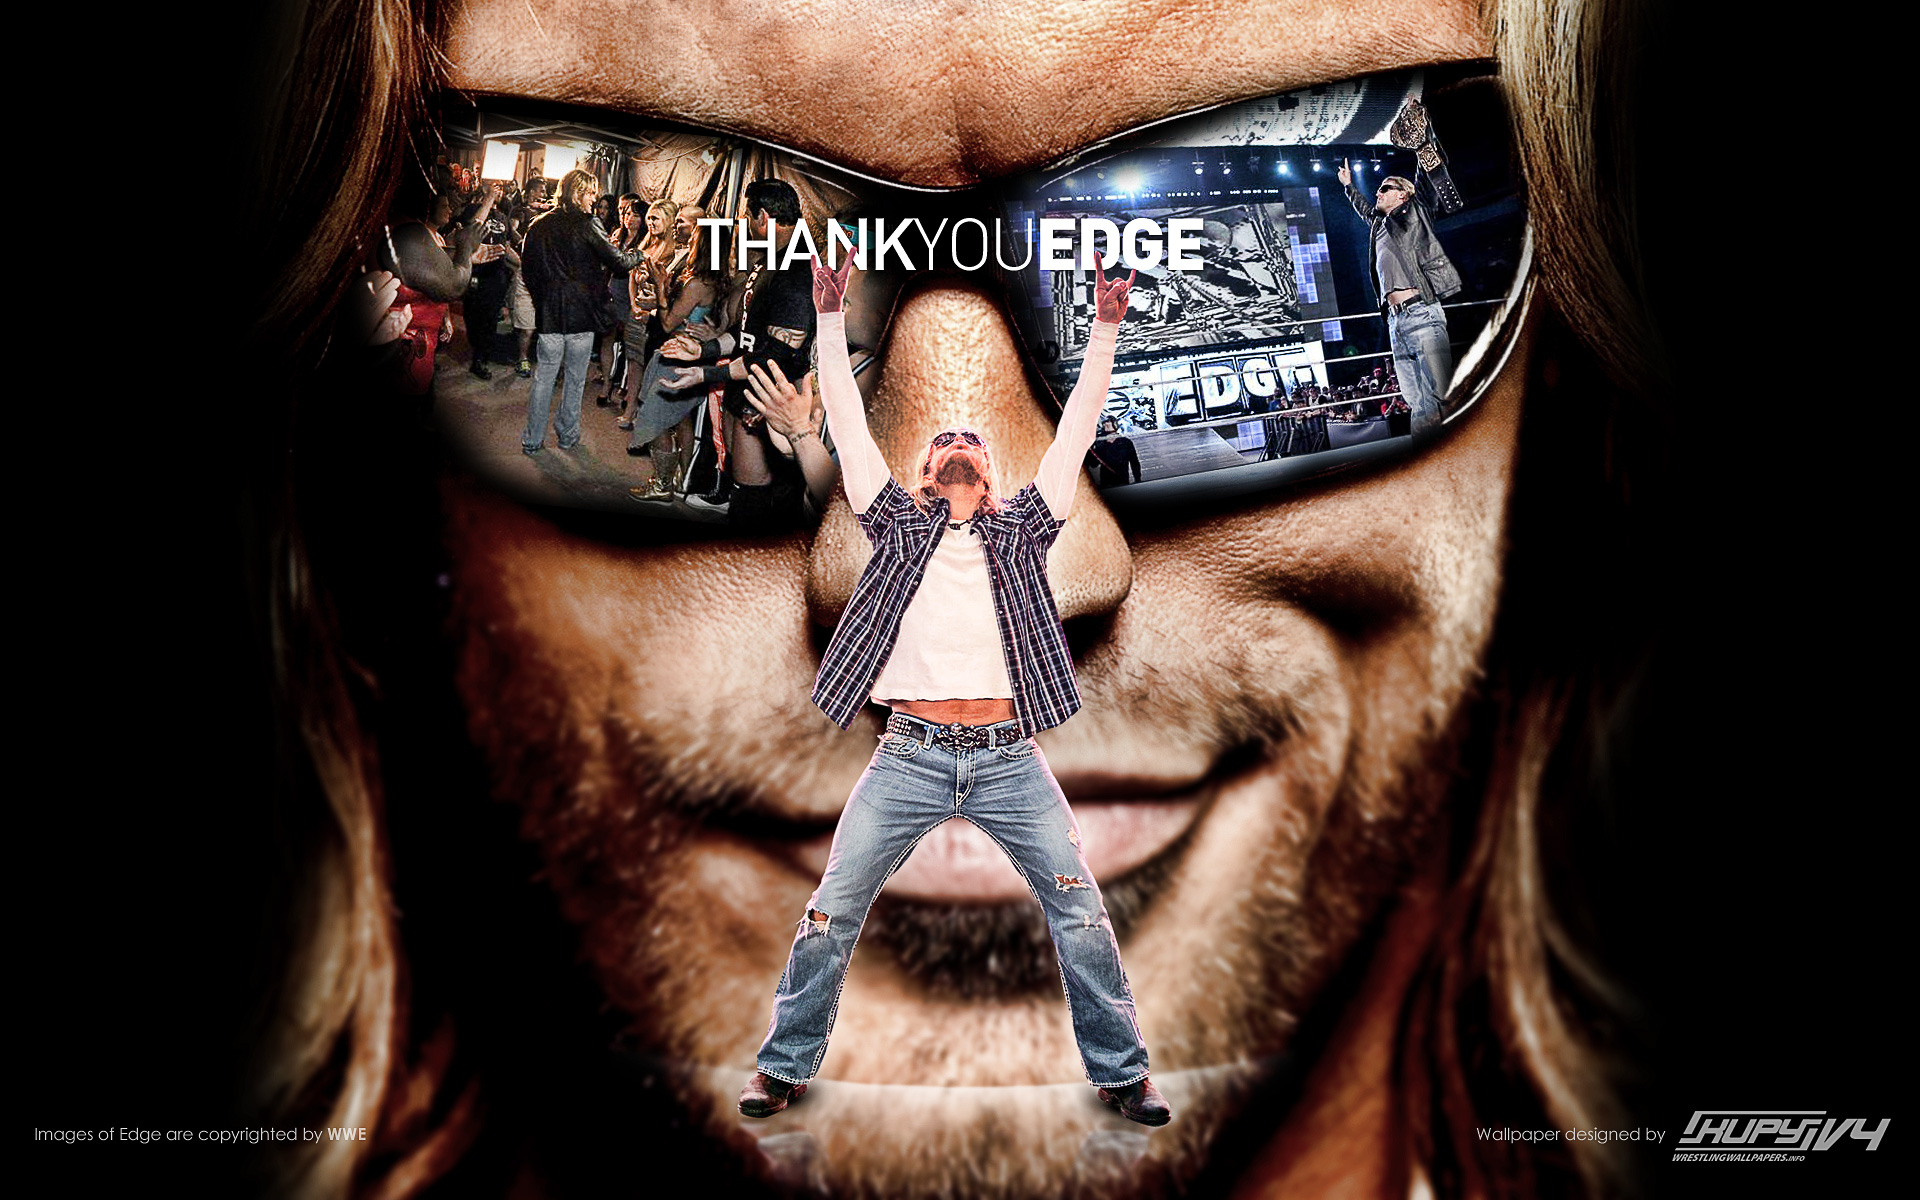 Edge Tribute Wallpaper Kupy Wrestling Wallpapers The Latest